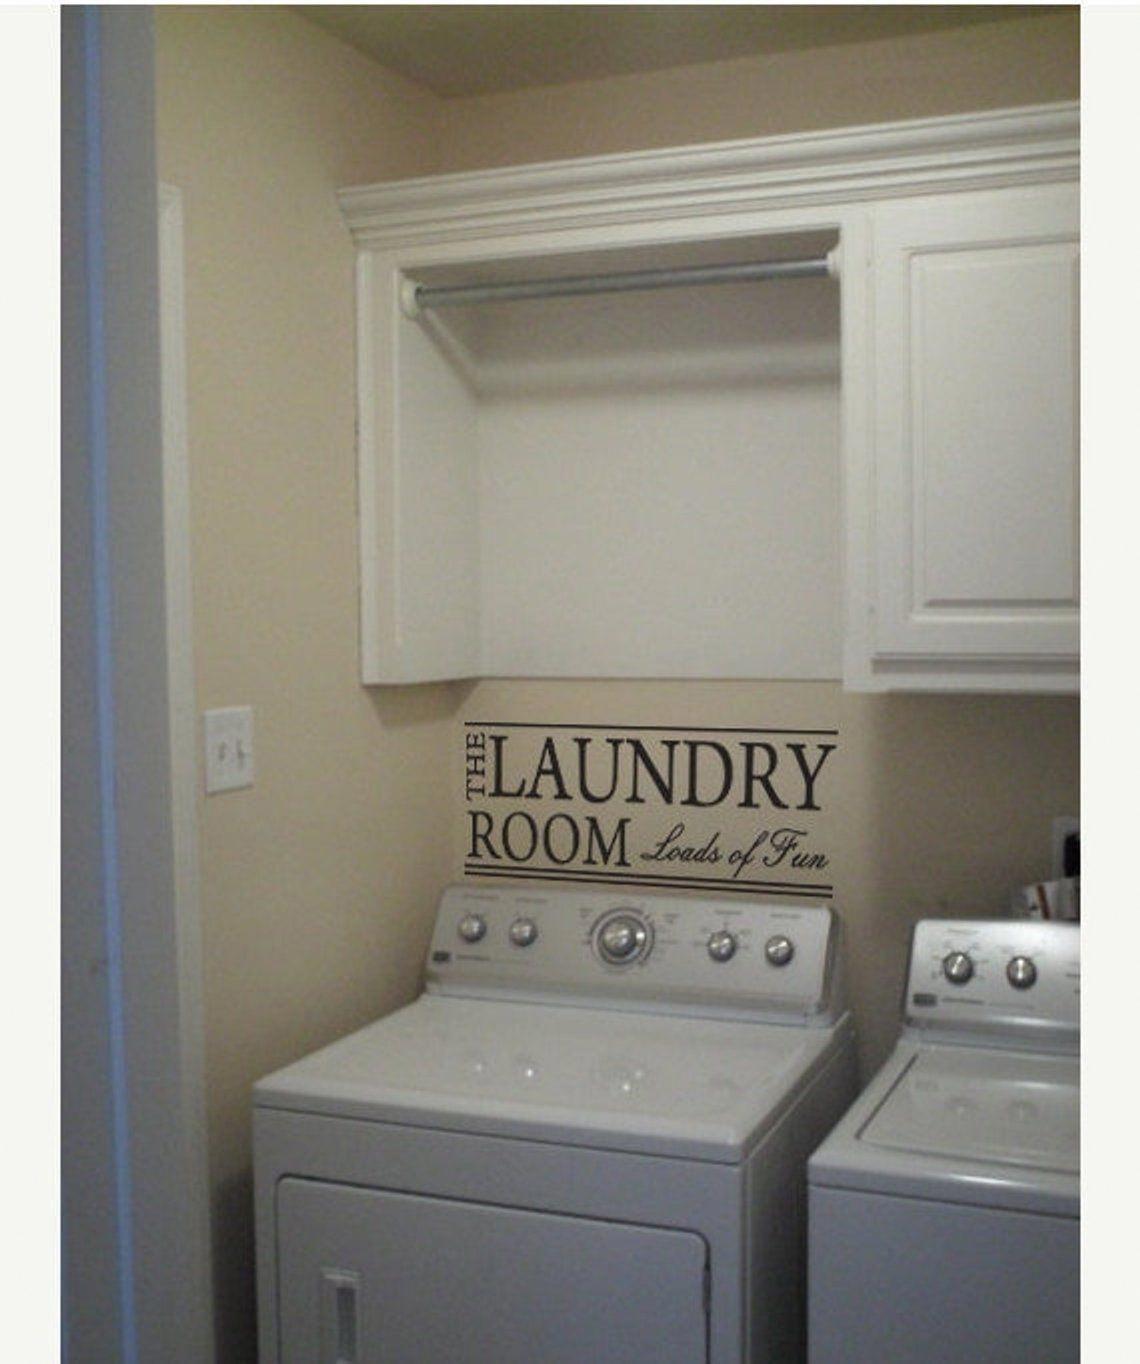 laundry room vinyl decal home wall decor laundry room on laundry room wall covering ideas id=48559